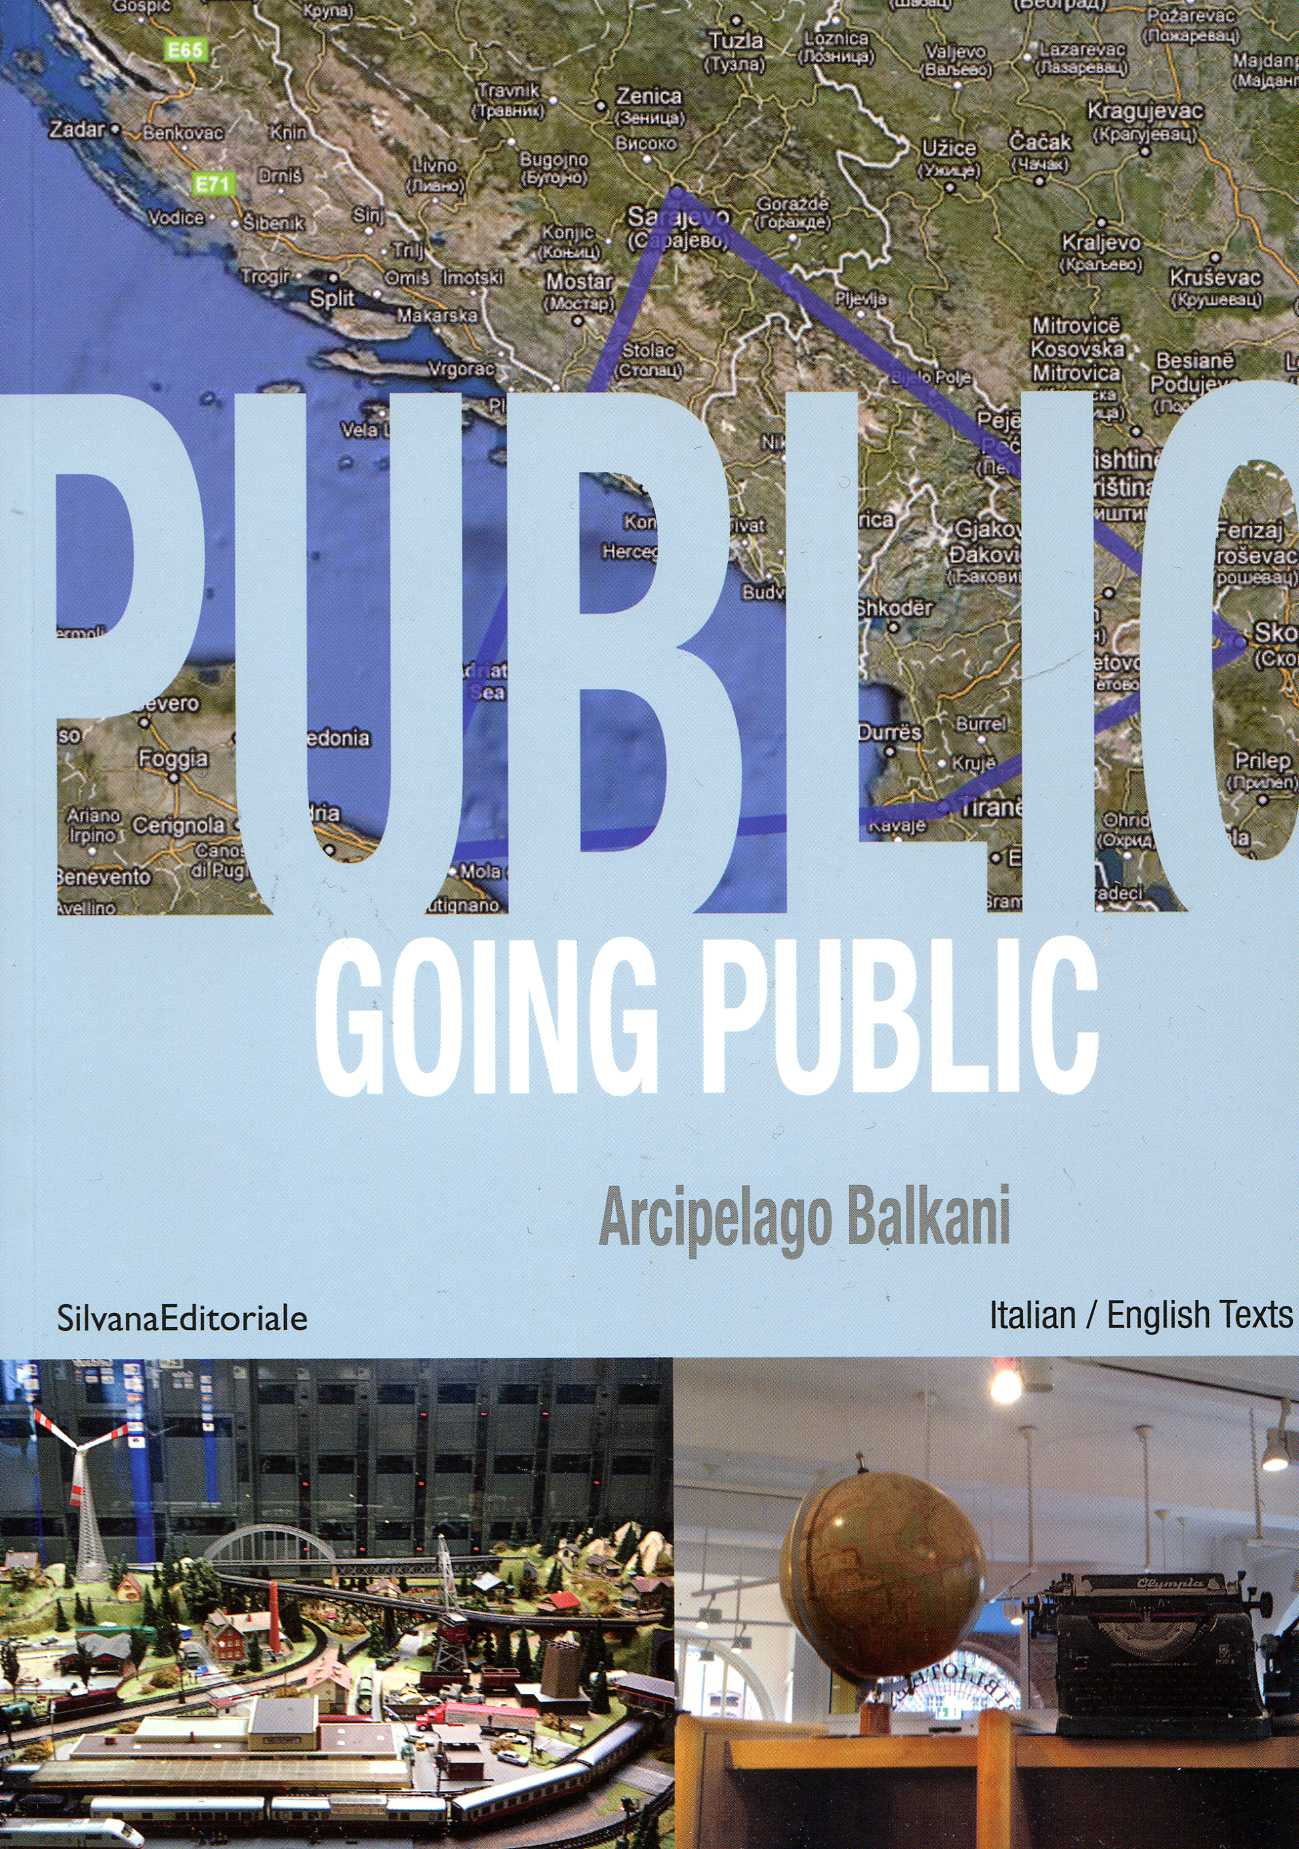 GOING PUBLIC 010 -ARCIPELI BALCANI (ITALIEN /ANGLAIS)